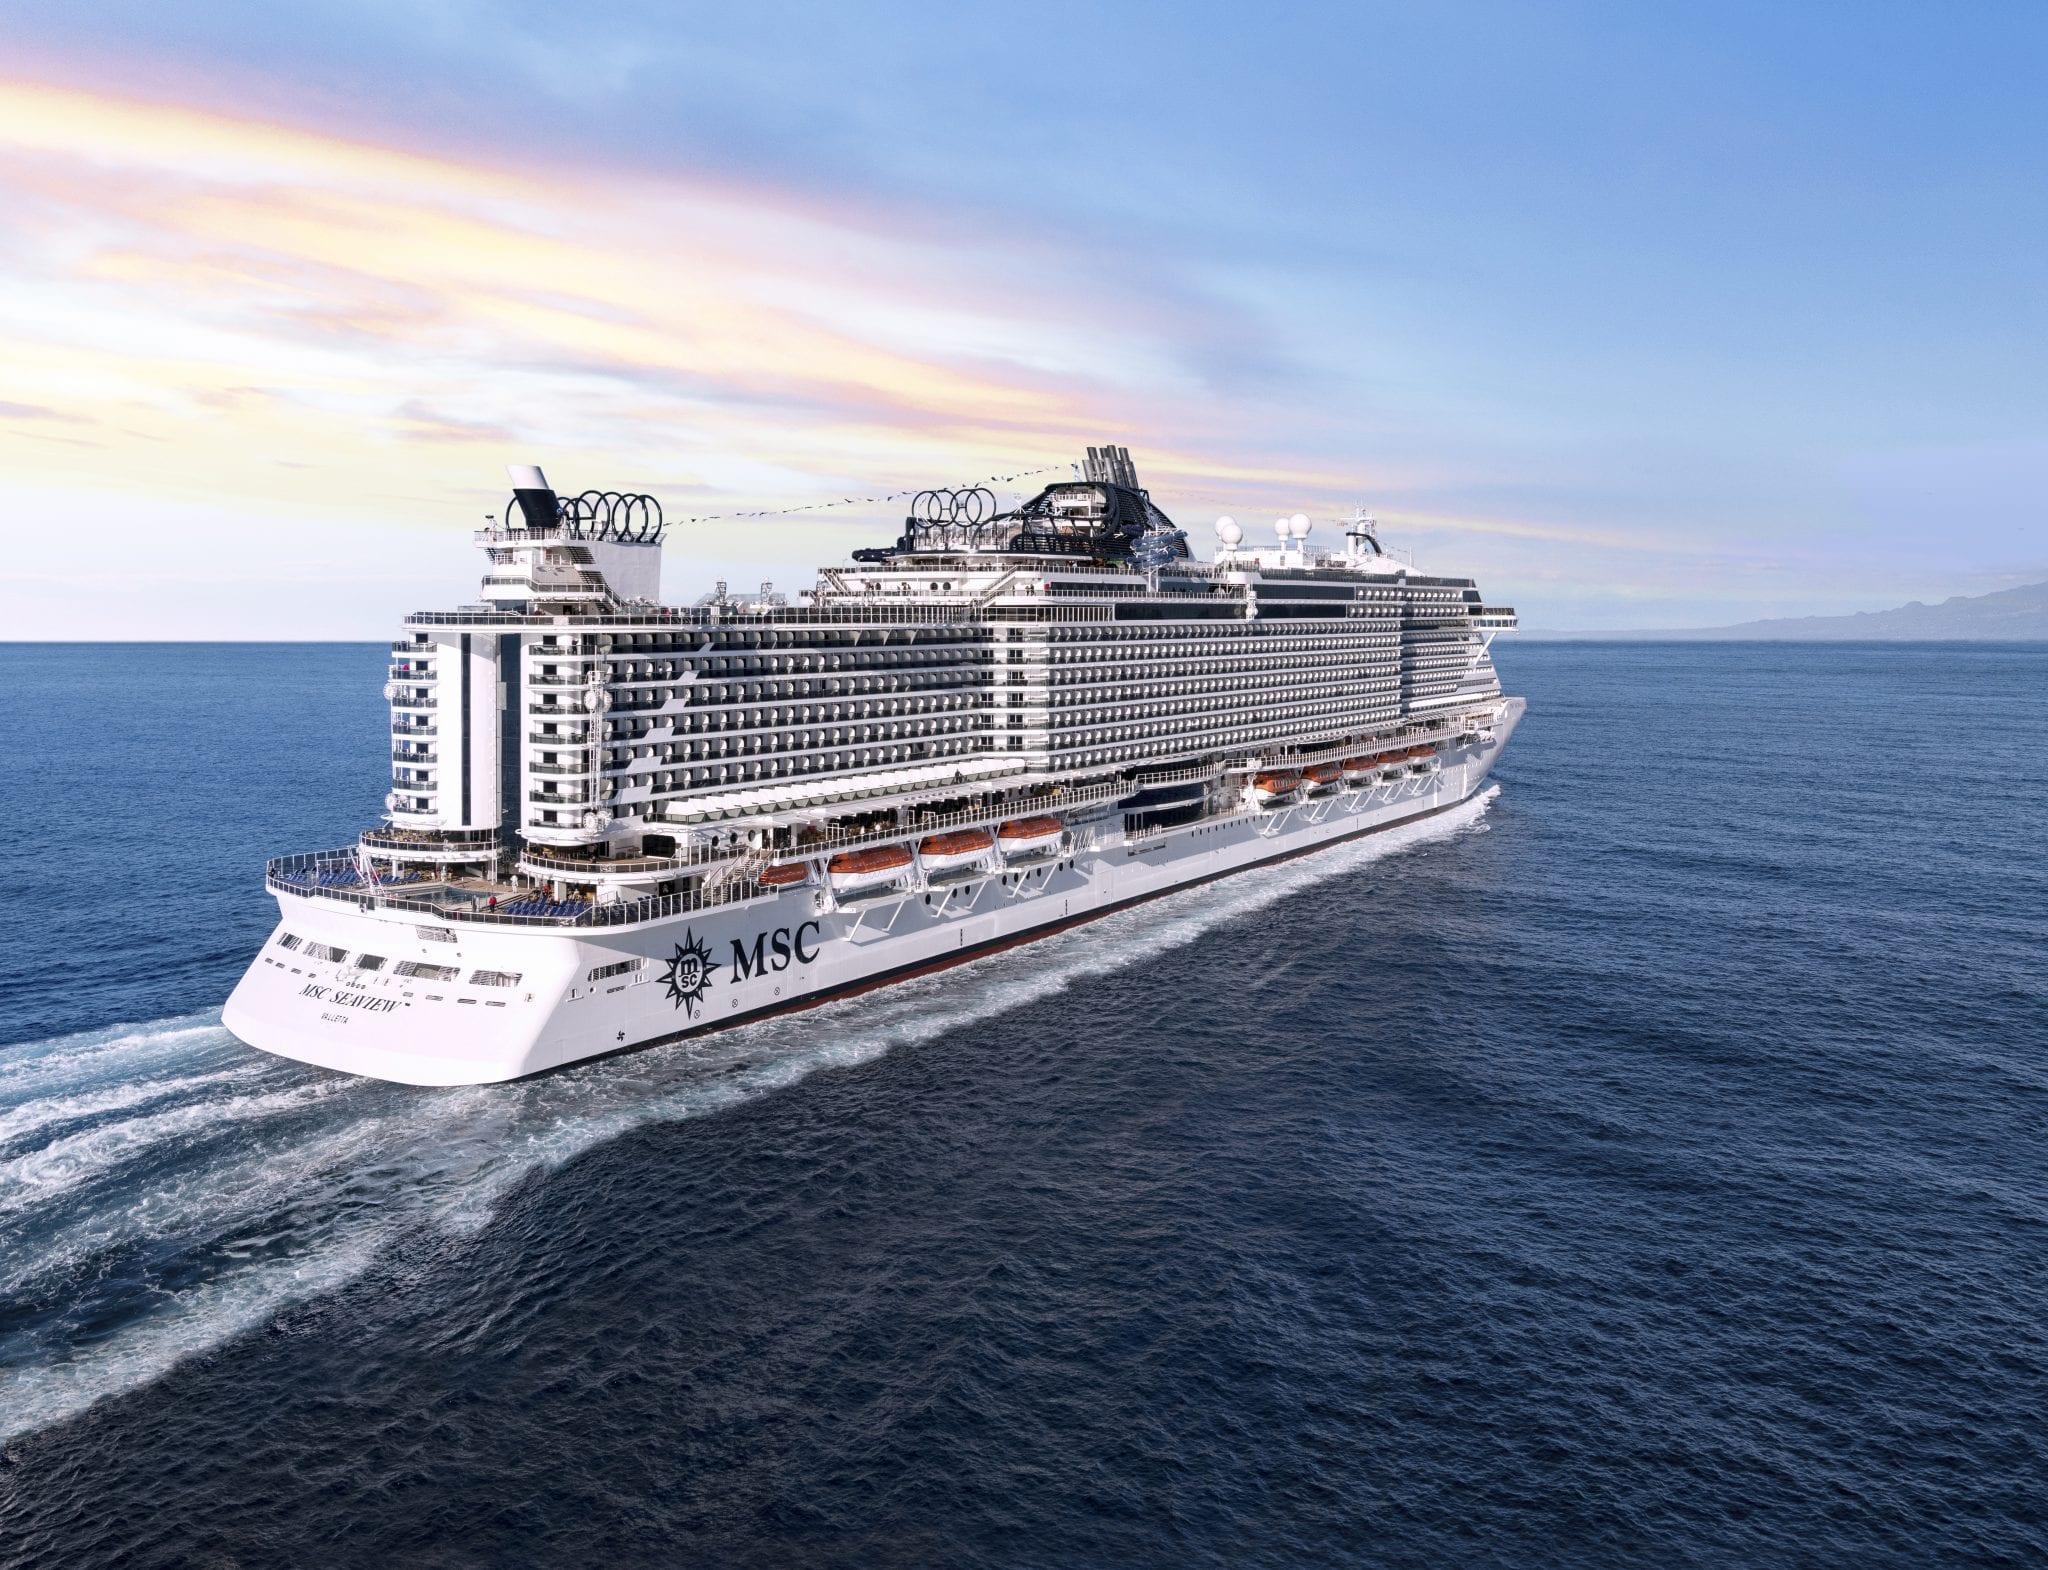 MSC Cruises Confirms Winter 2021/22 Sailing Schedule